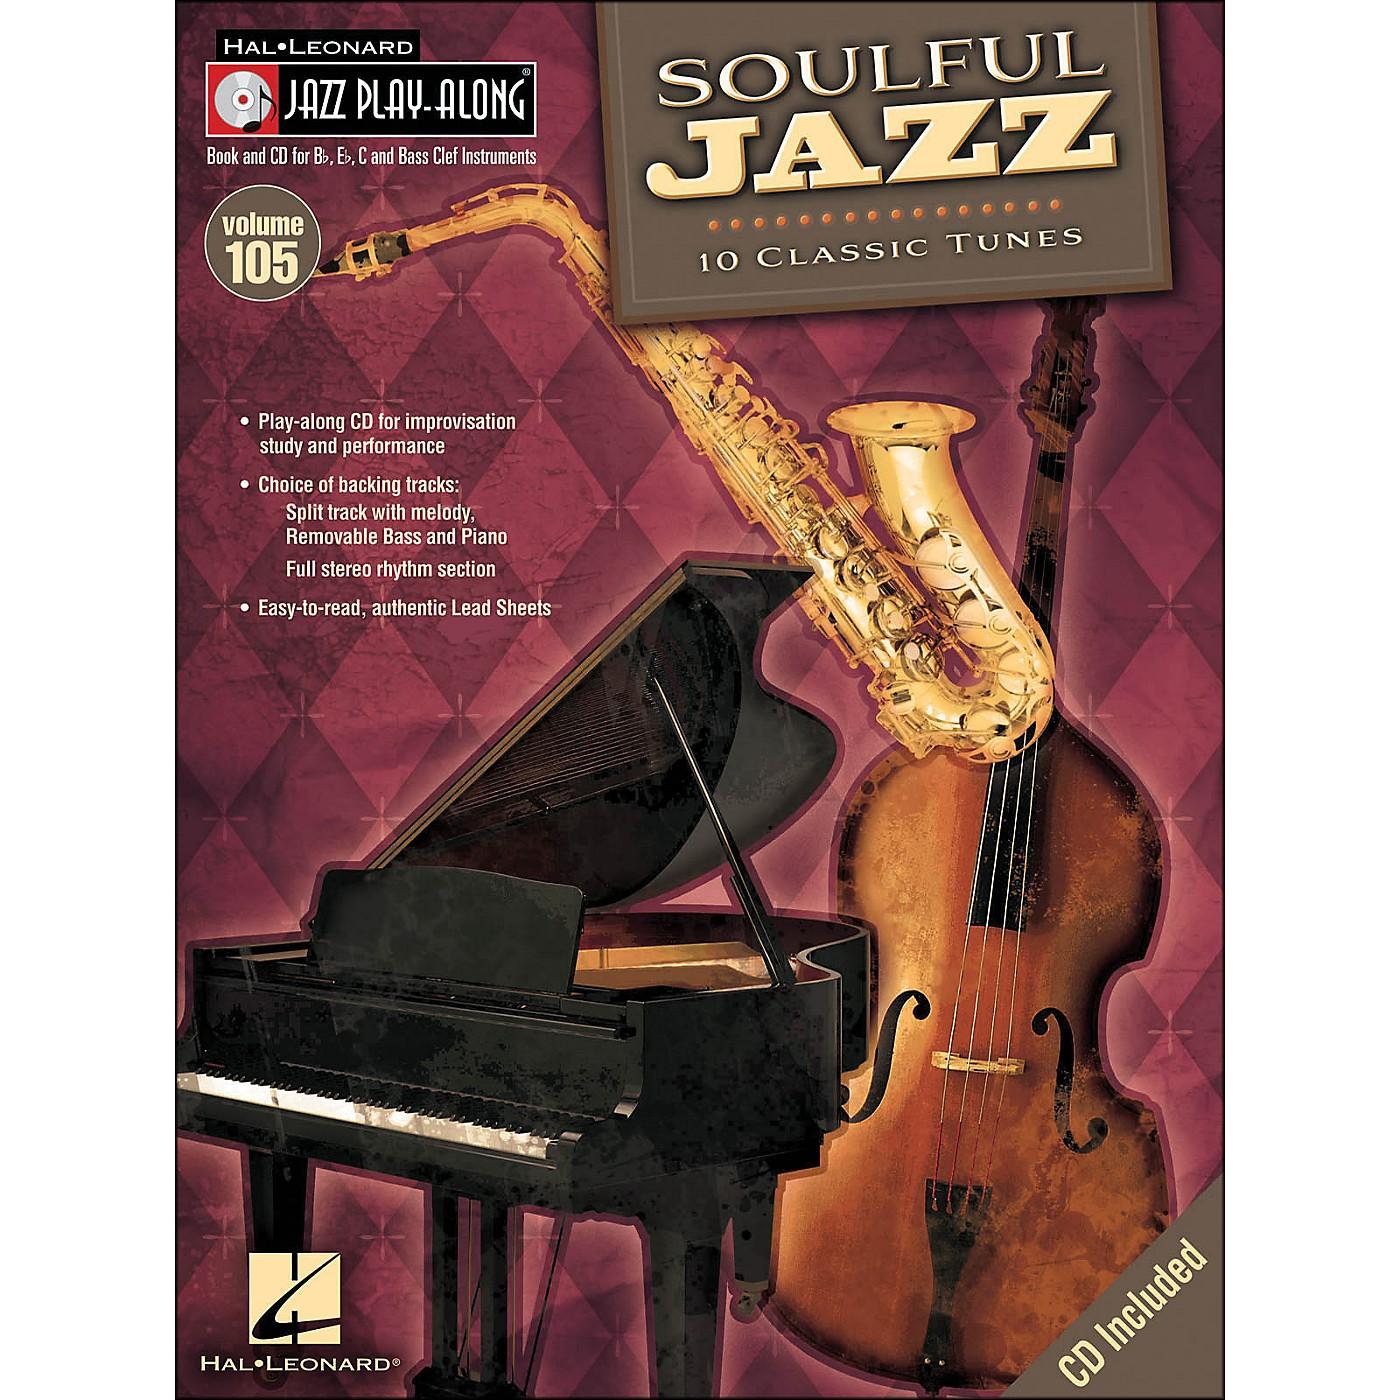 Hal Leonard Soulful Jazz - Jazz Play-Along Volume 105 (CD/Pkg) thumbnail